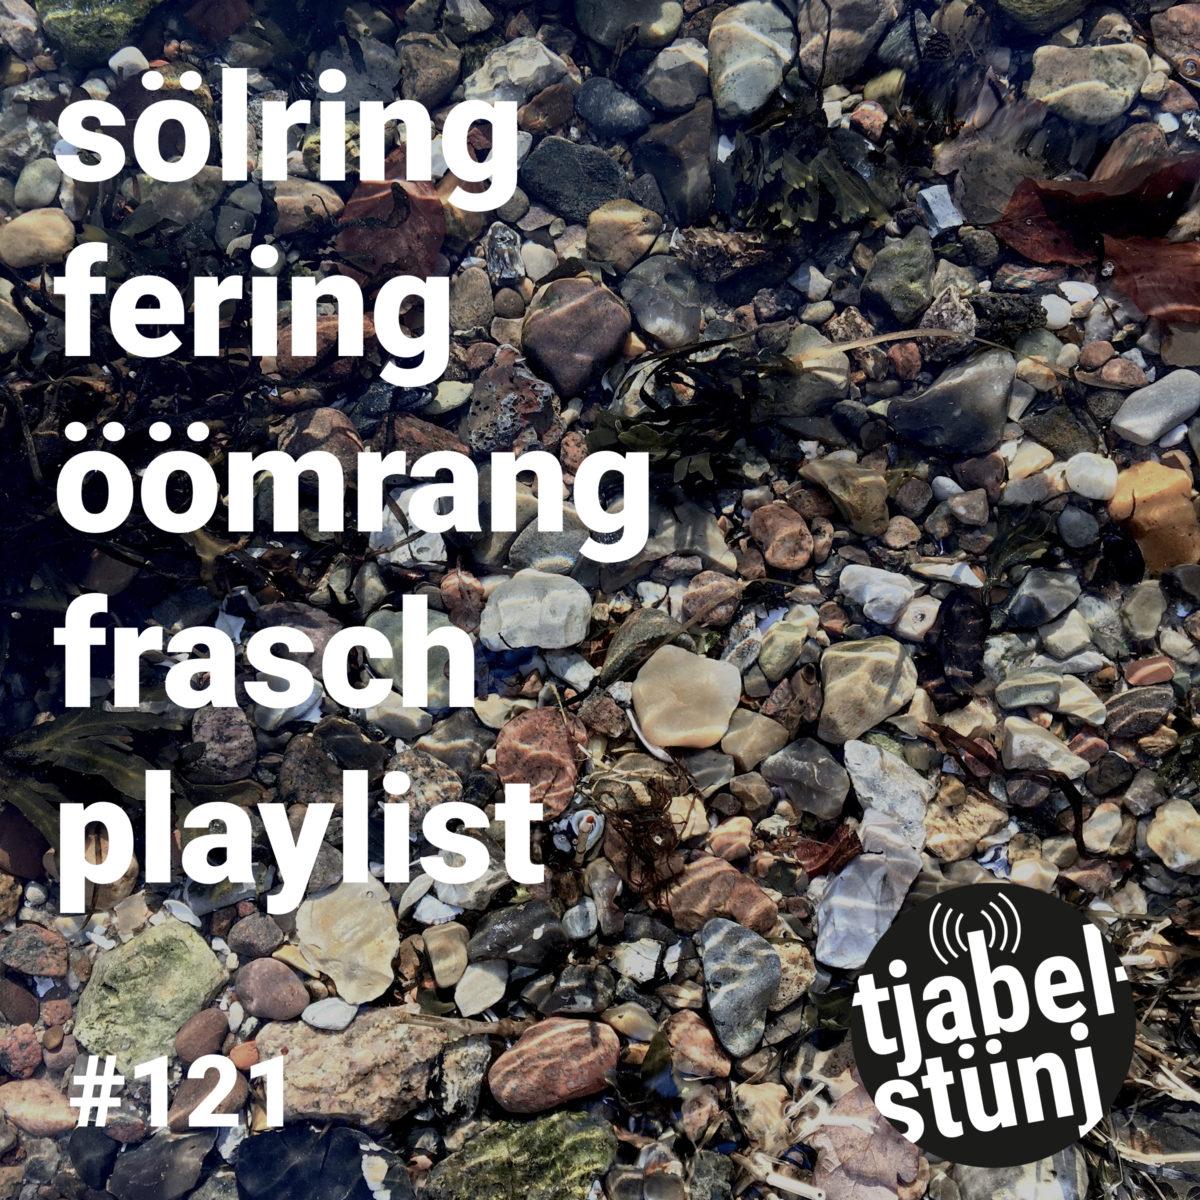 Playlist #121